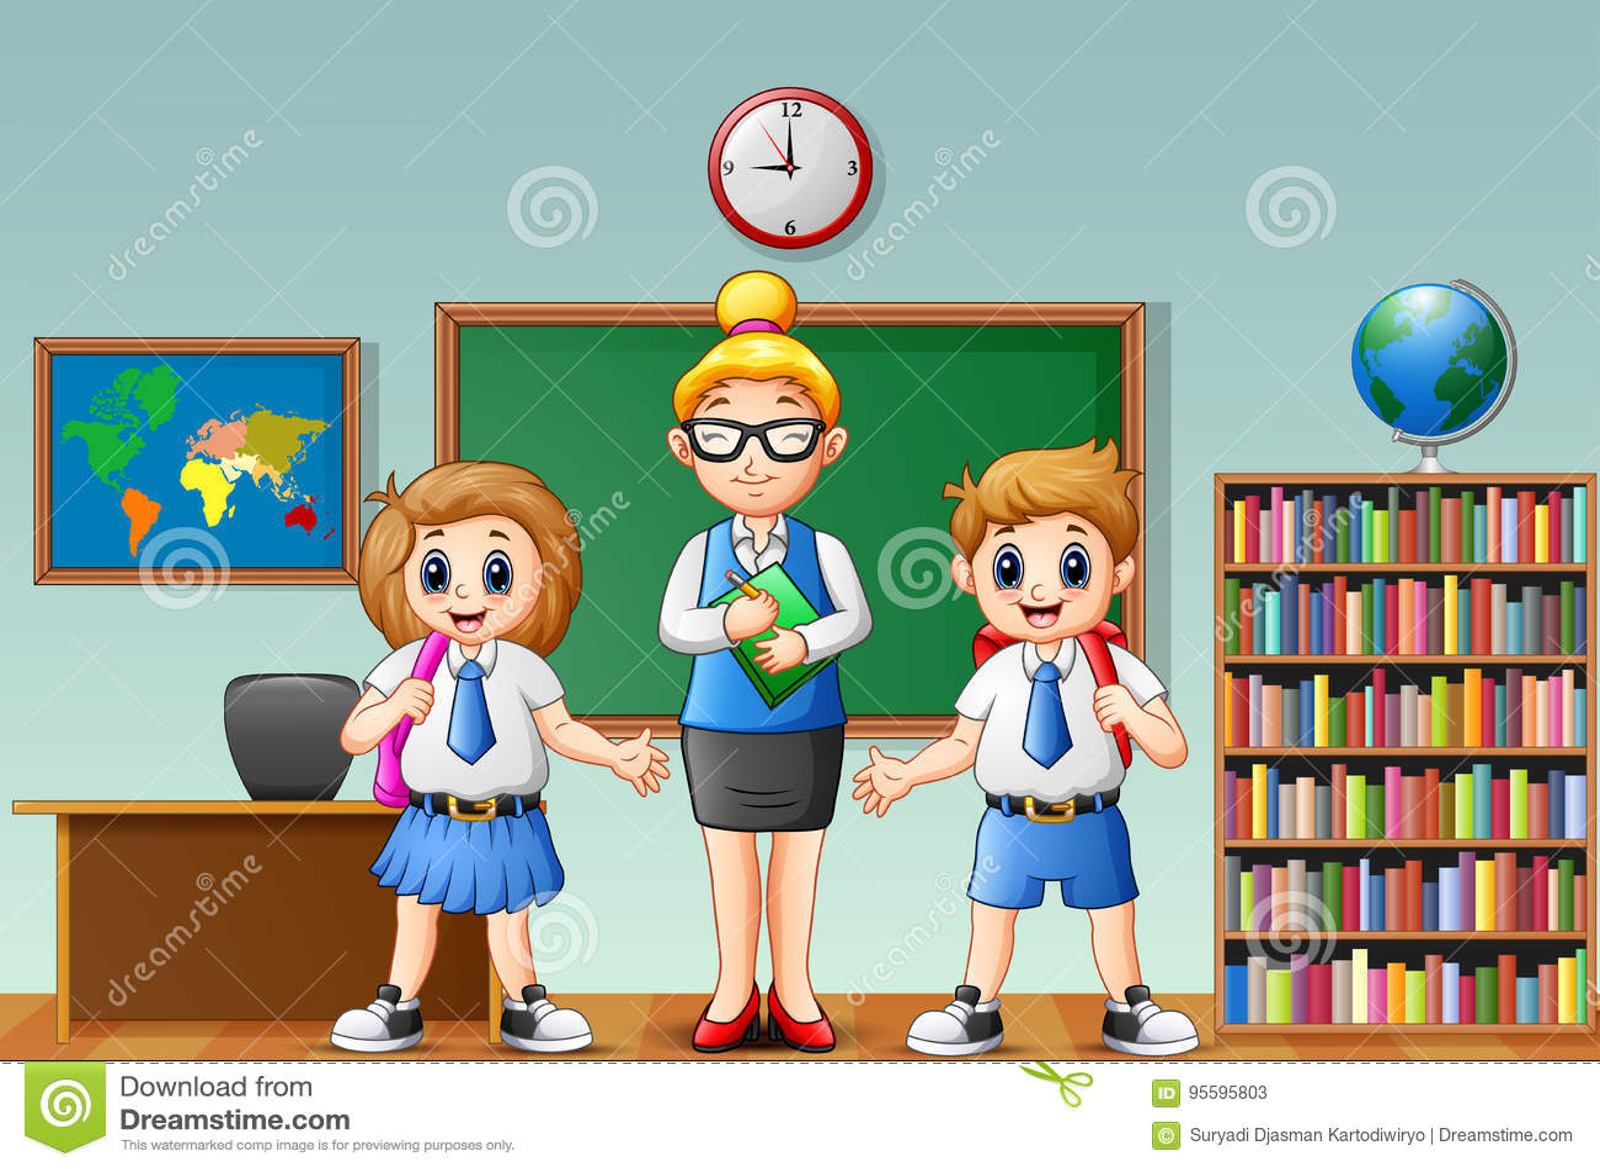 cartoon female teacher and students in school uniform at